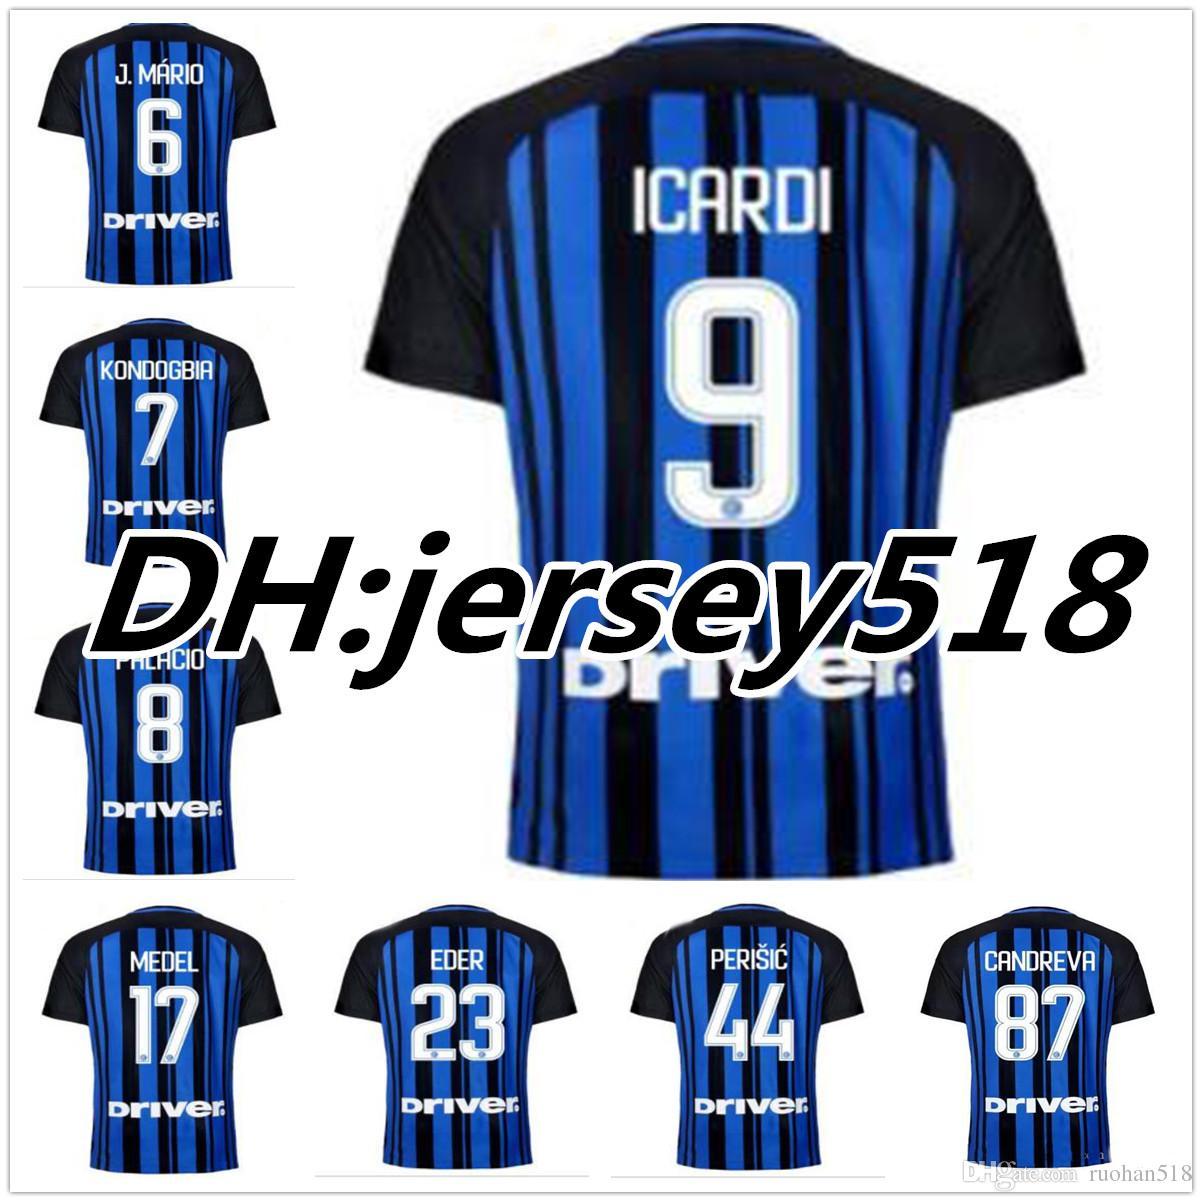 d648307714d7 2019 Top Thai Quality 17 18 Inter Home Soccer Jersey 20 17 2018 JOVETIC  ICARDI PALACIO KONDOGBIA MEDEL CANDREVA Milan Football Shirts From  Ruohan518